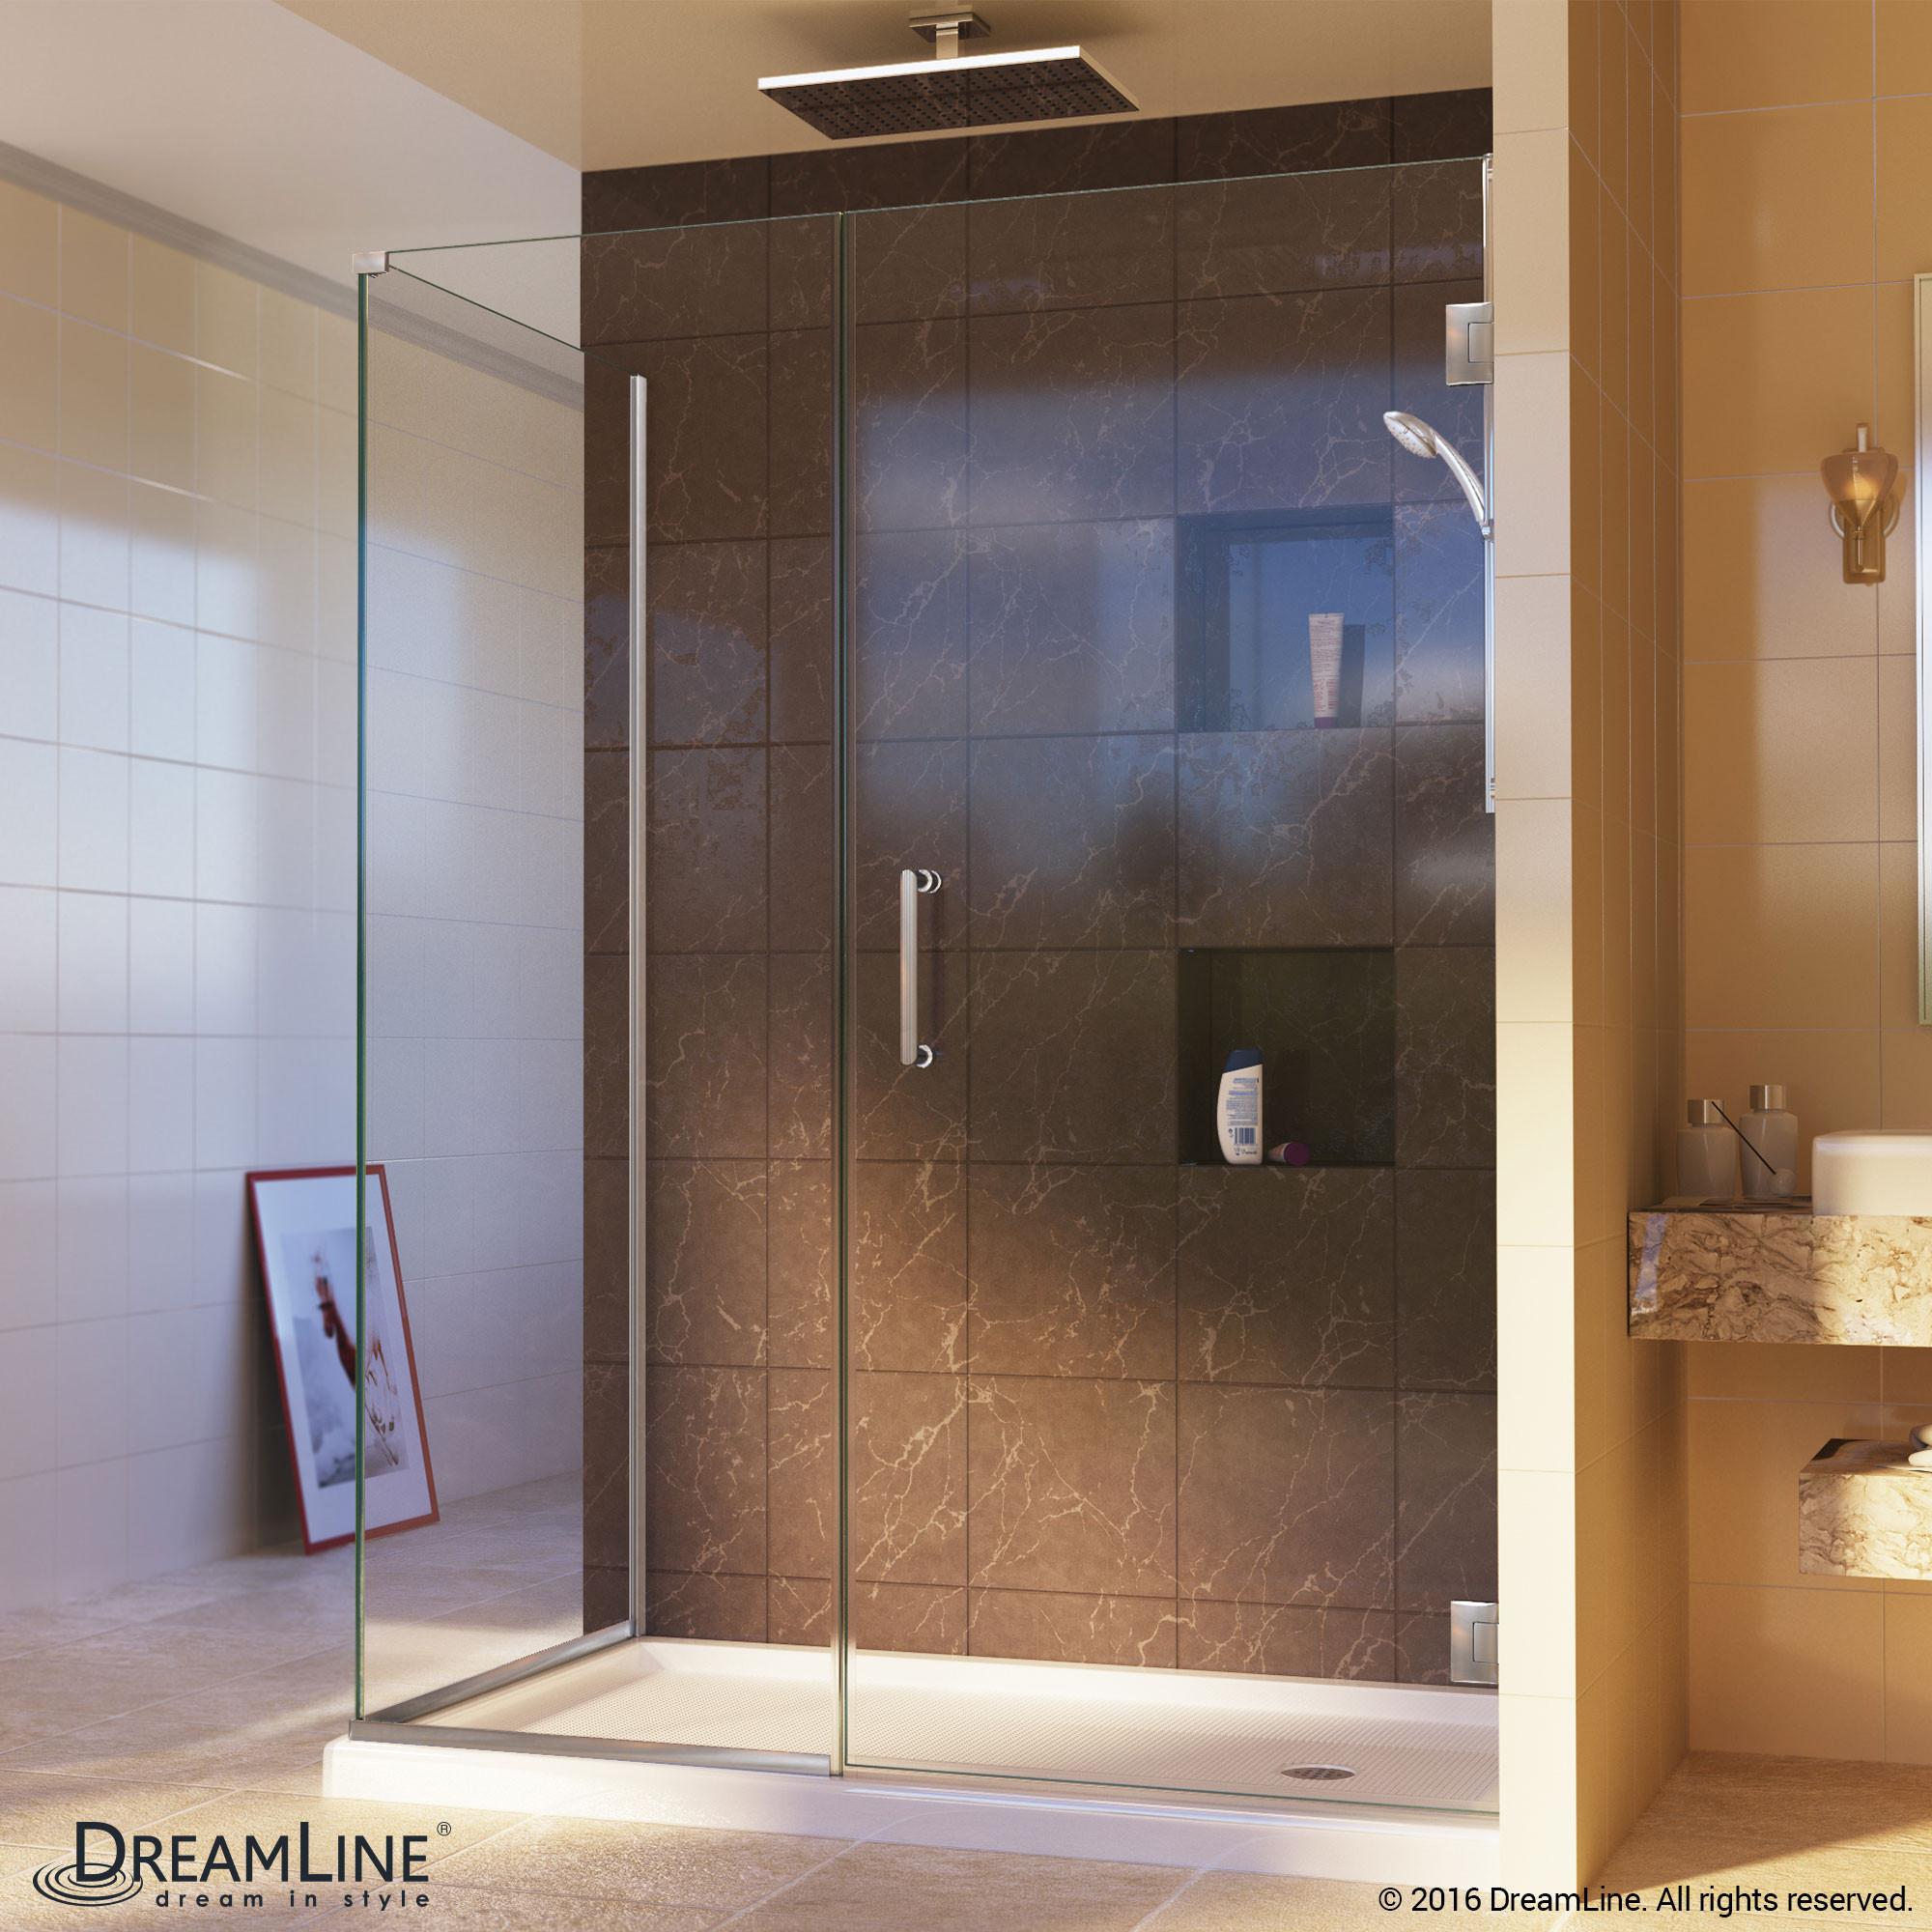 DreamLine SHEN-24495340-04 Unidoor Plus Hinged Shower Enclosure In Brushed Nickel Finish Hardware